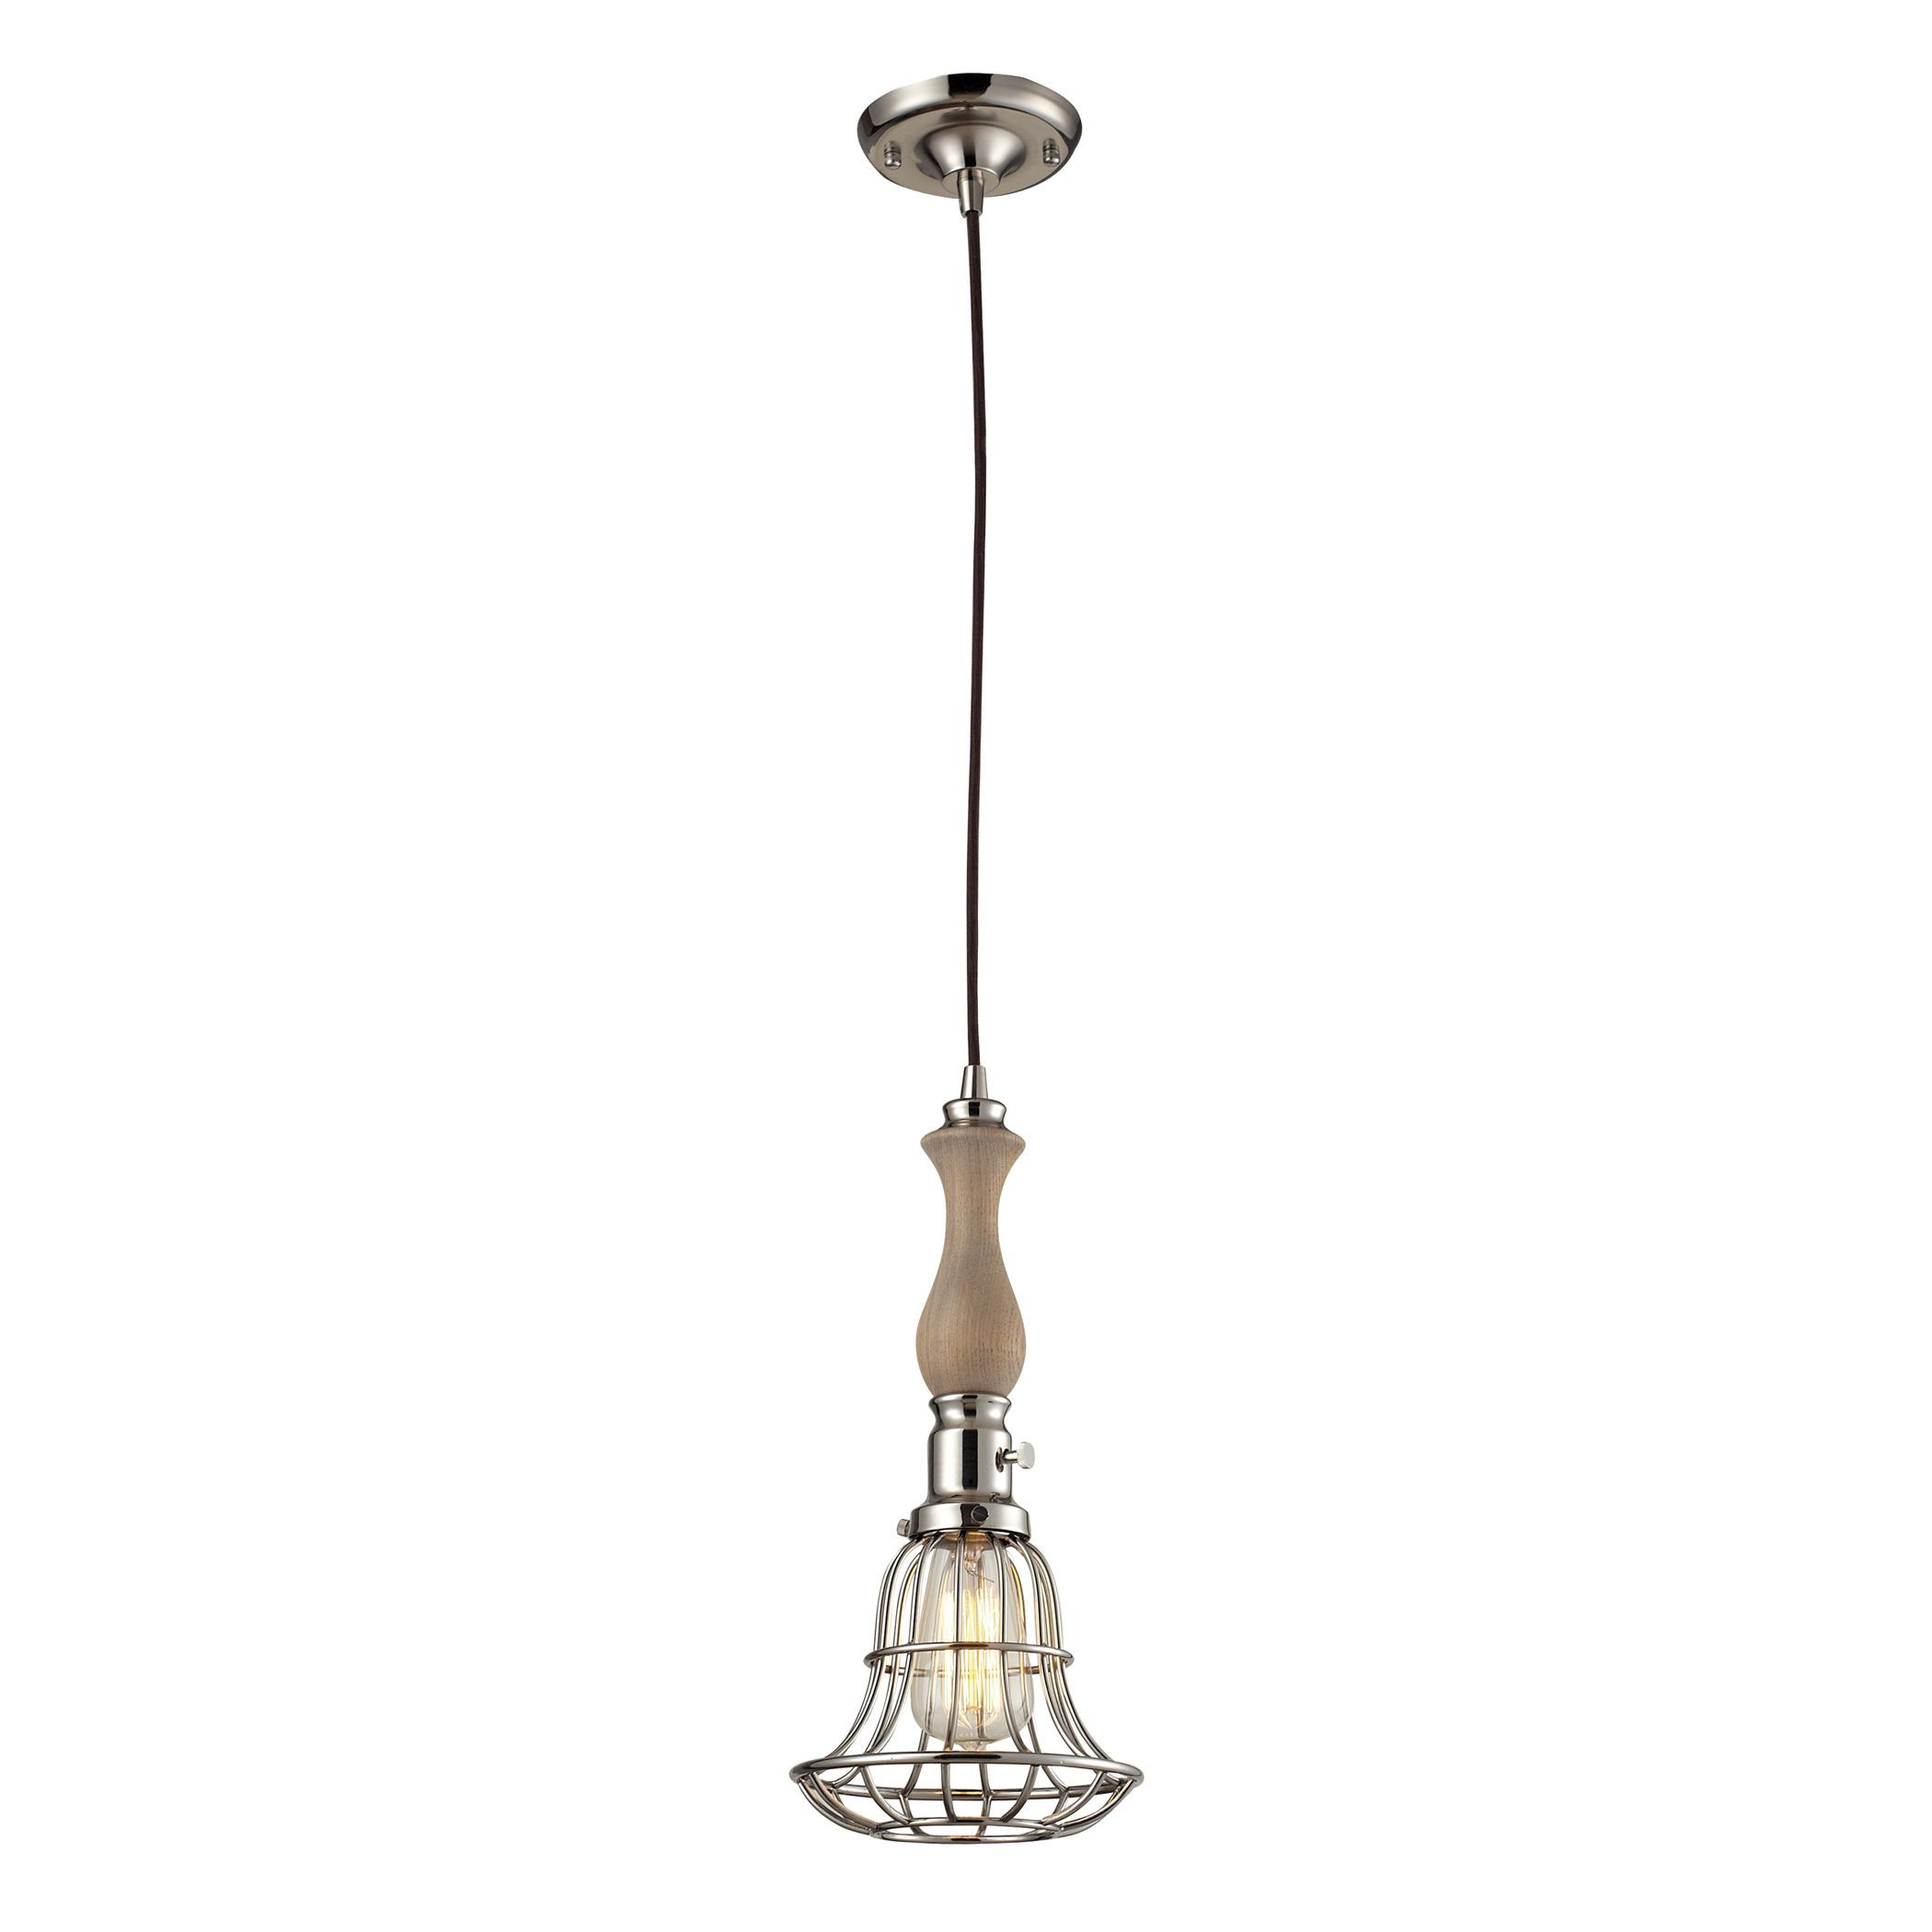 Elk Lighting Spun Wood Single-light Washed Pine/ Polished Nickel Pendant